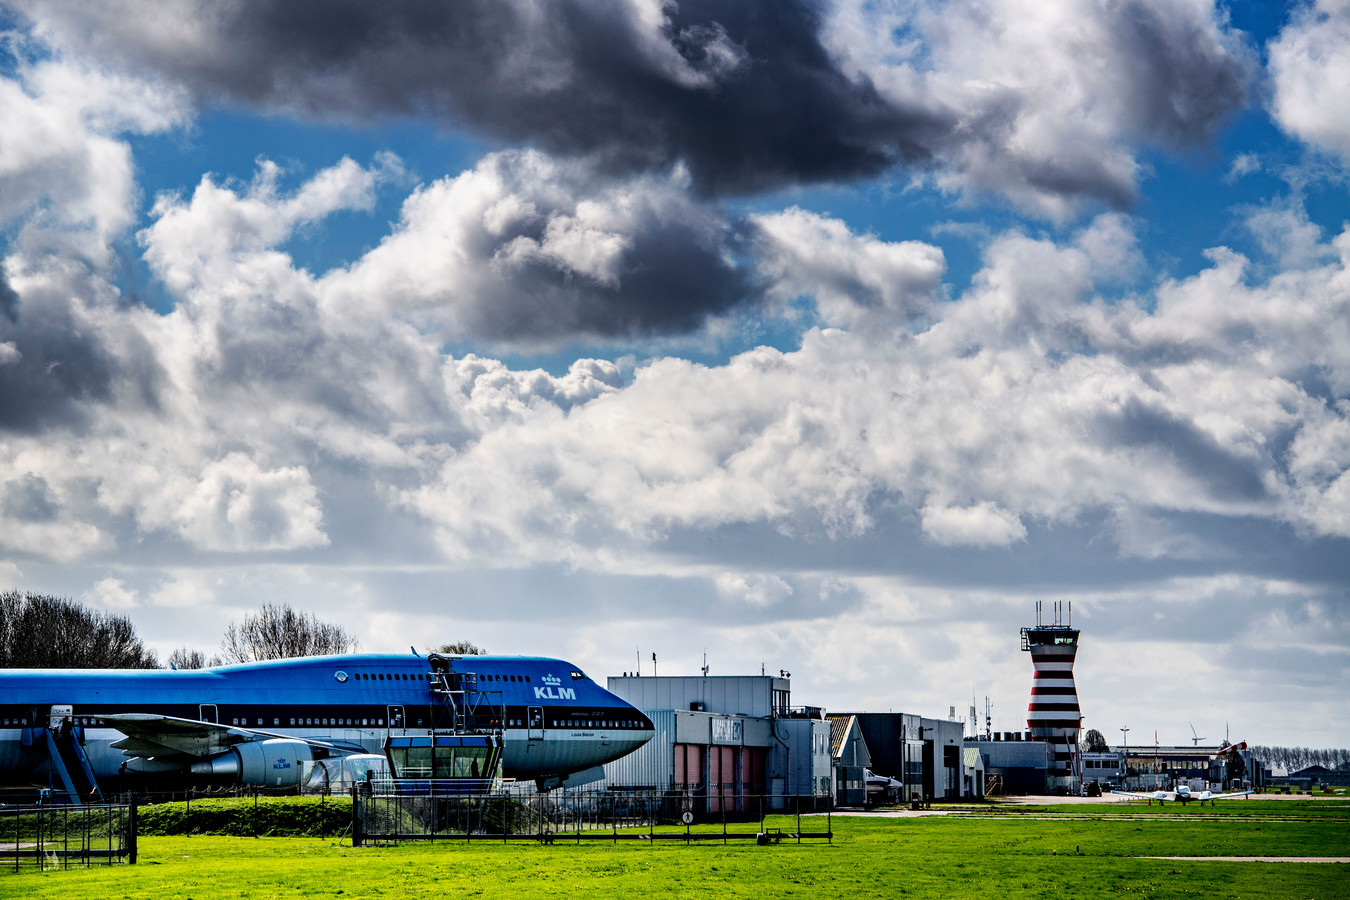 Donkere wolken boven Lelystad Airport.